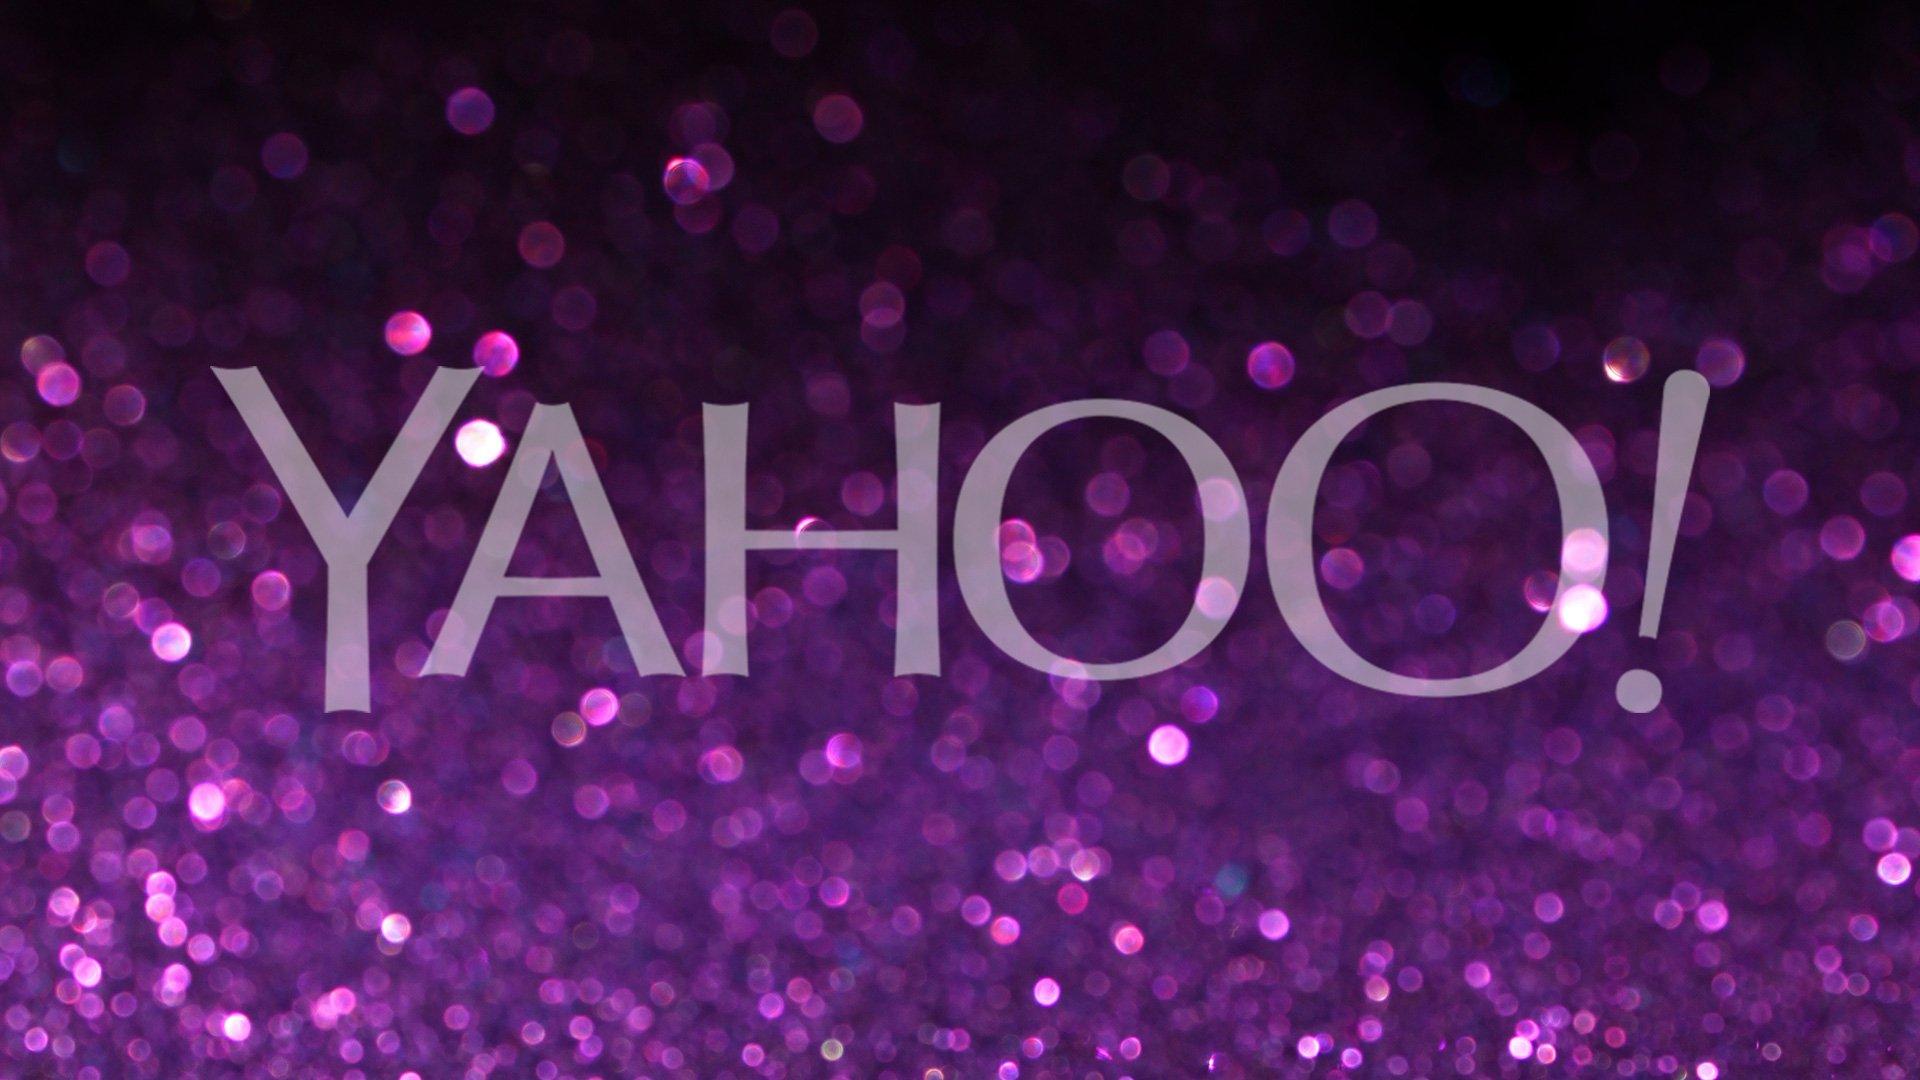 Yahoo HD Wallpaper Background Image 1920x1080 ID856235 1920x1080